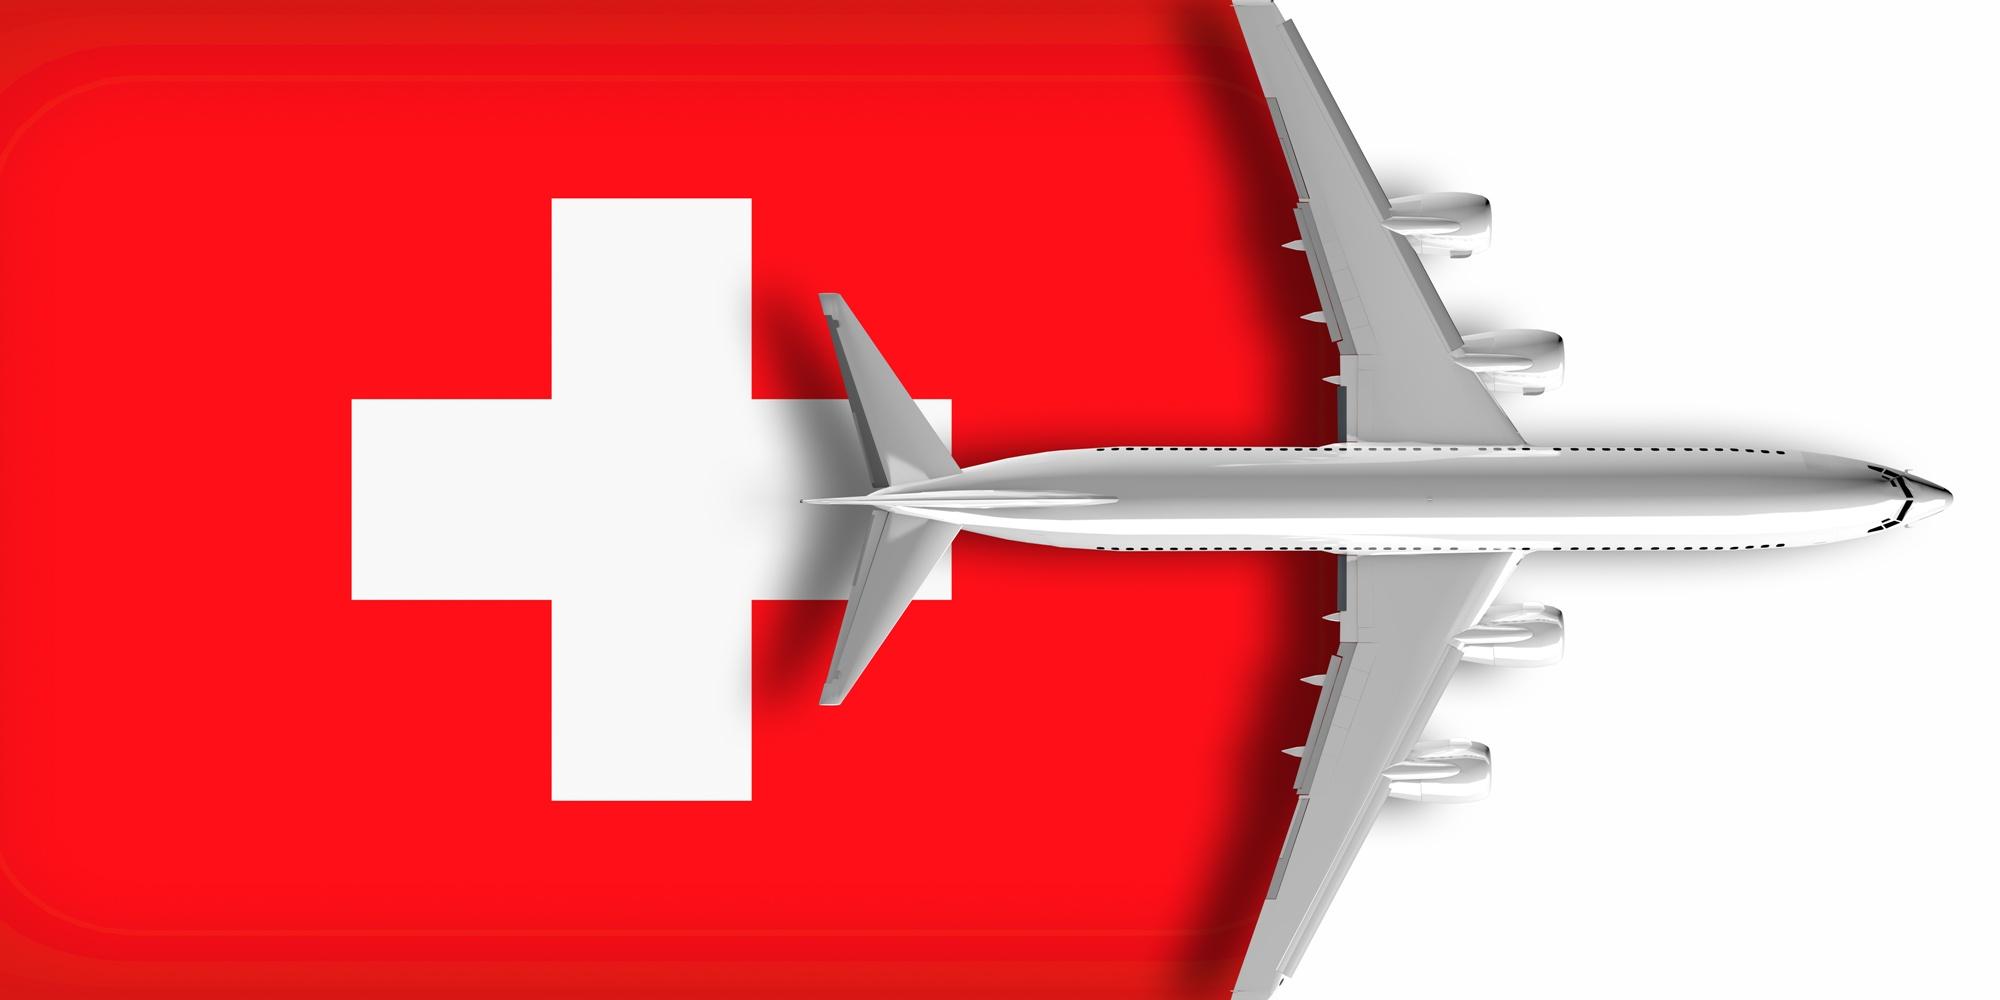 Чартеры в Швейцарию. Туры в Швейцарию с перелетом